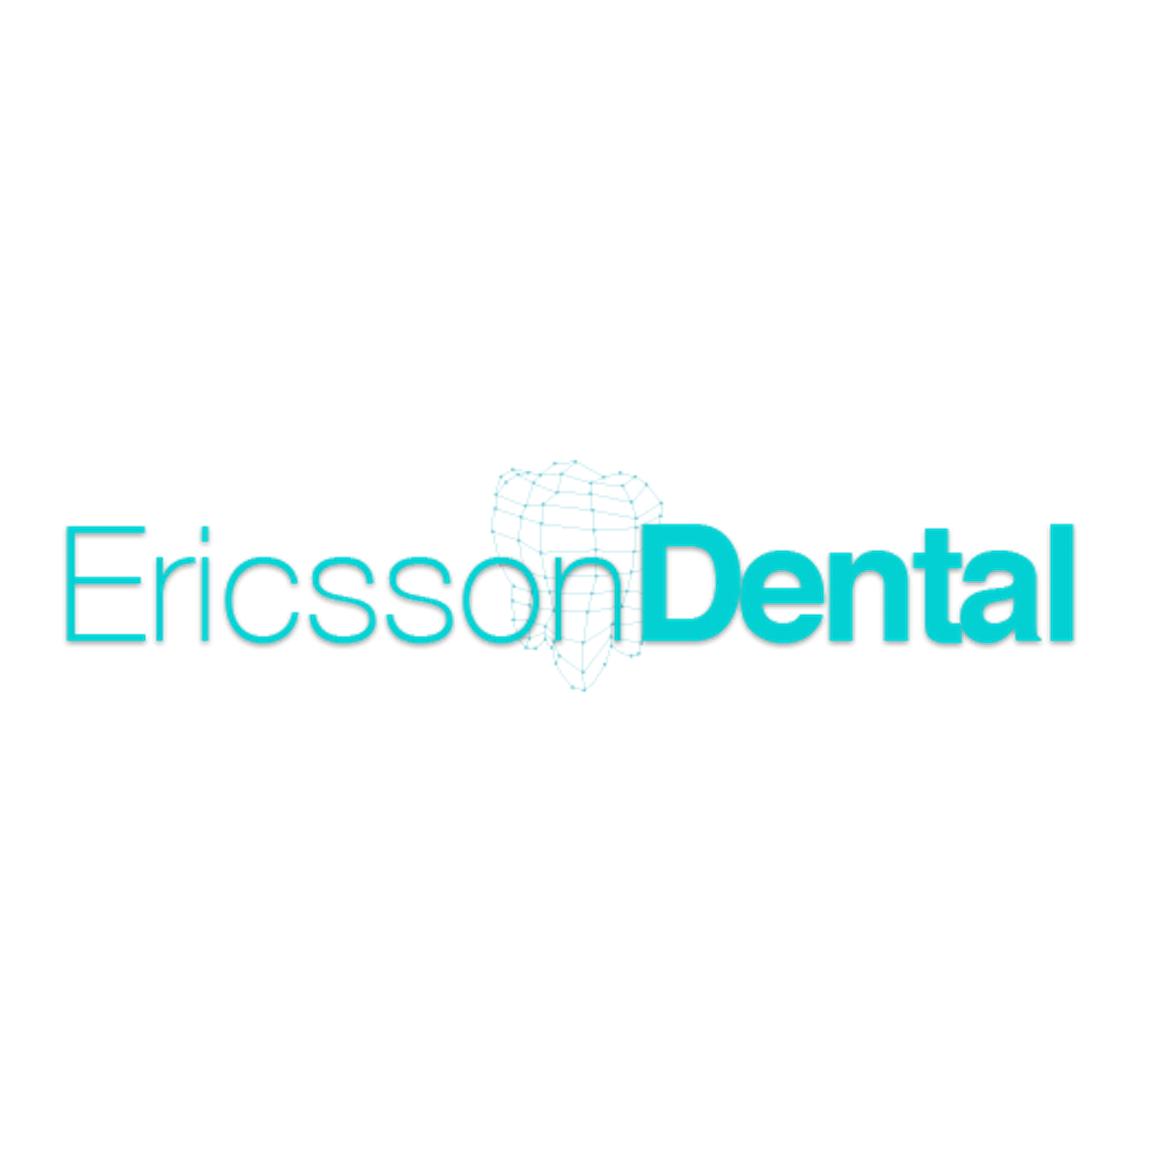 Ericsson Dental